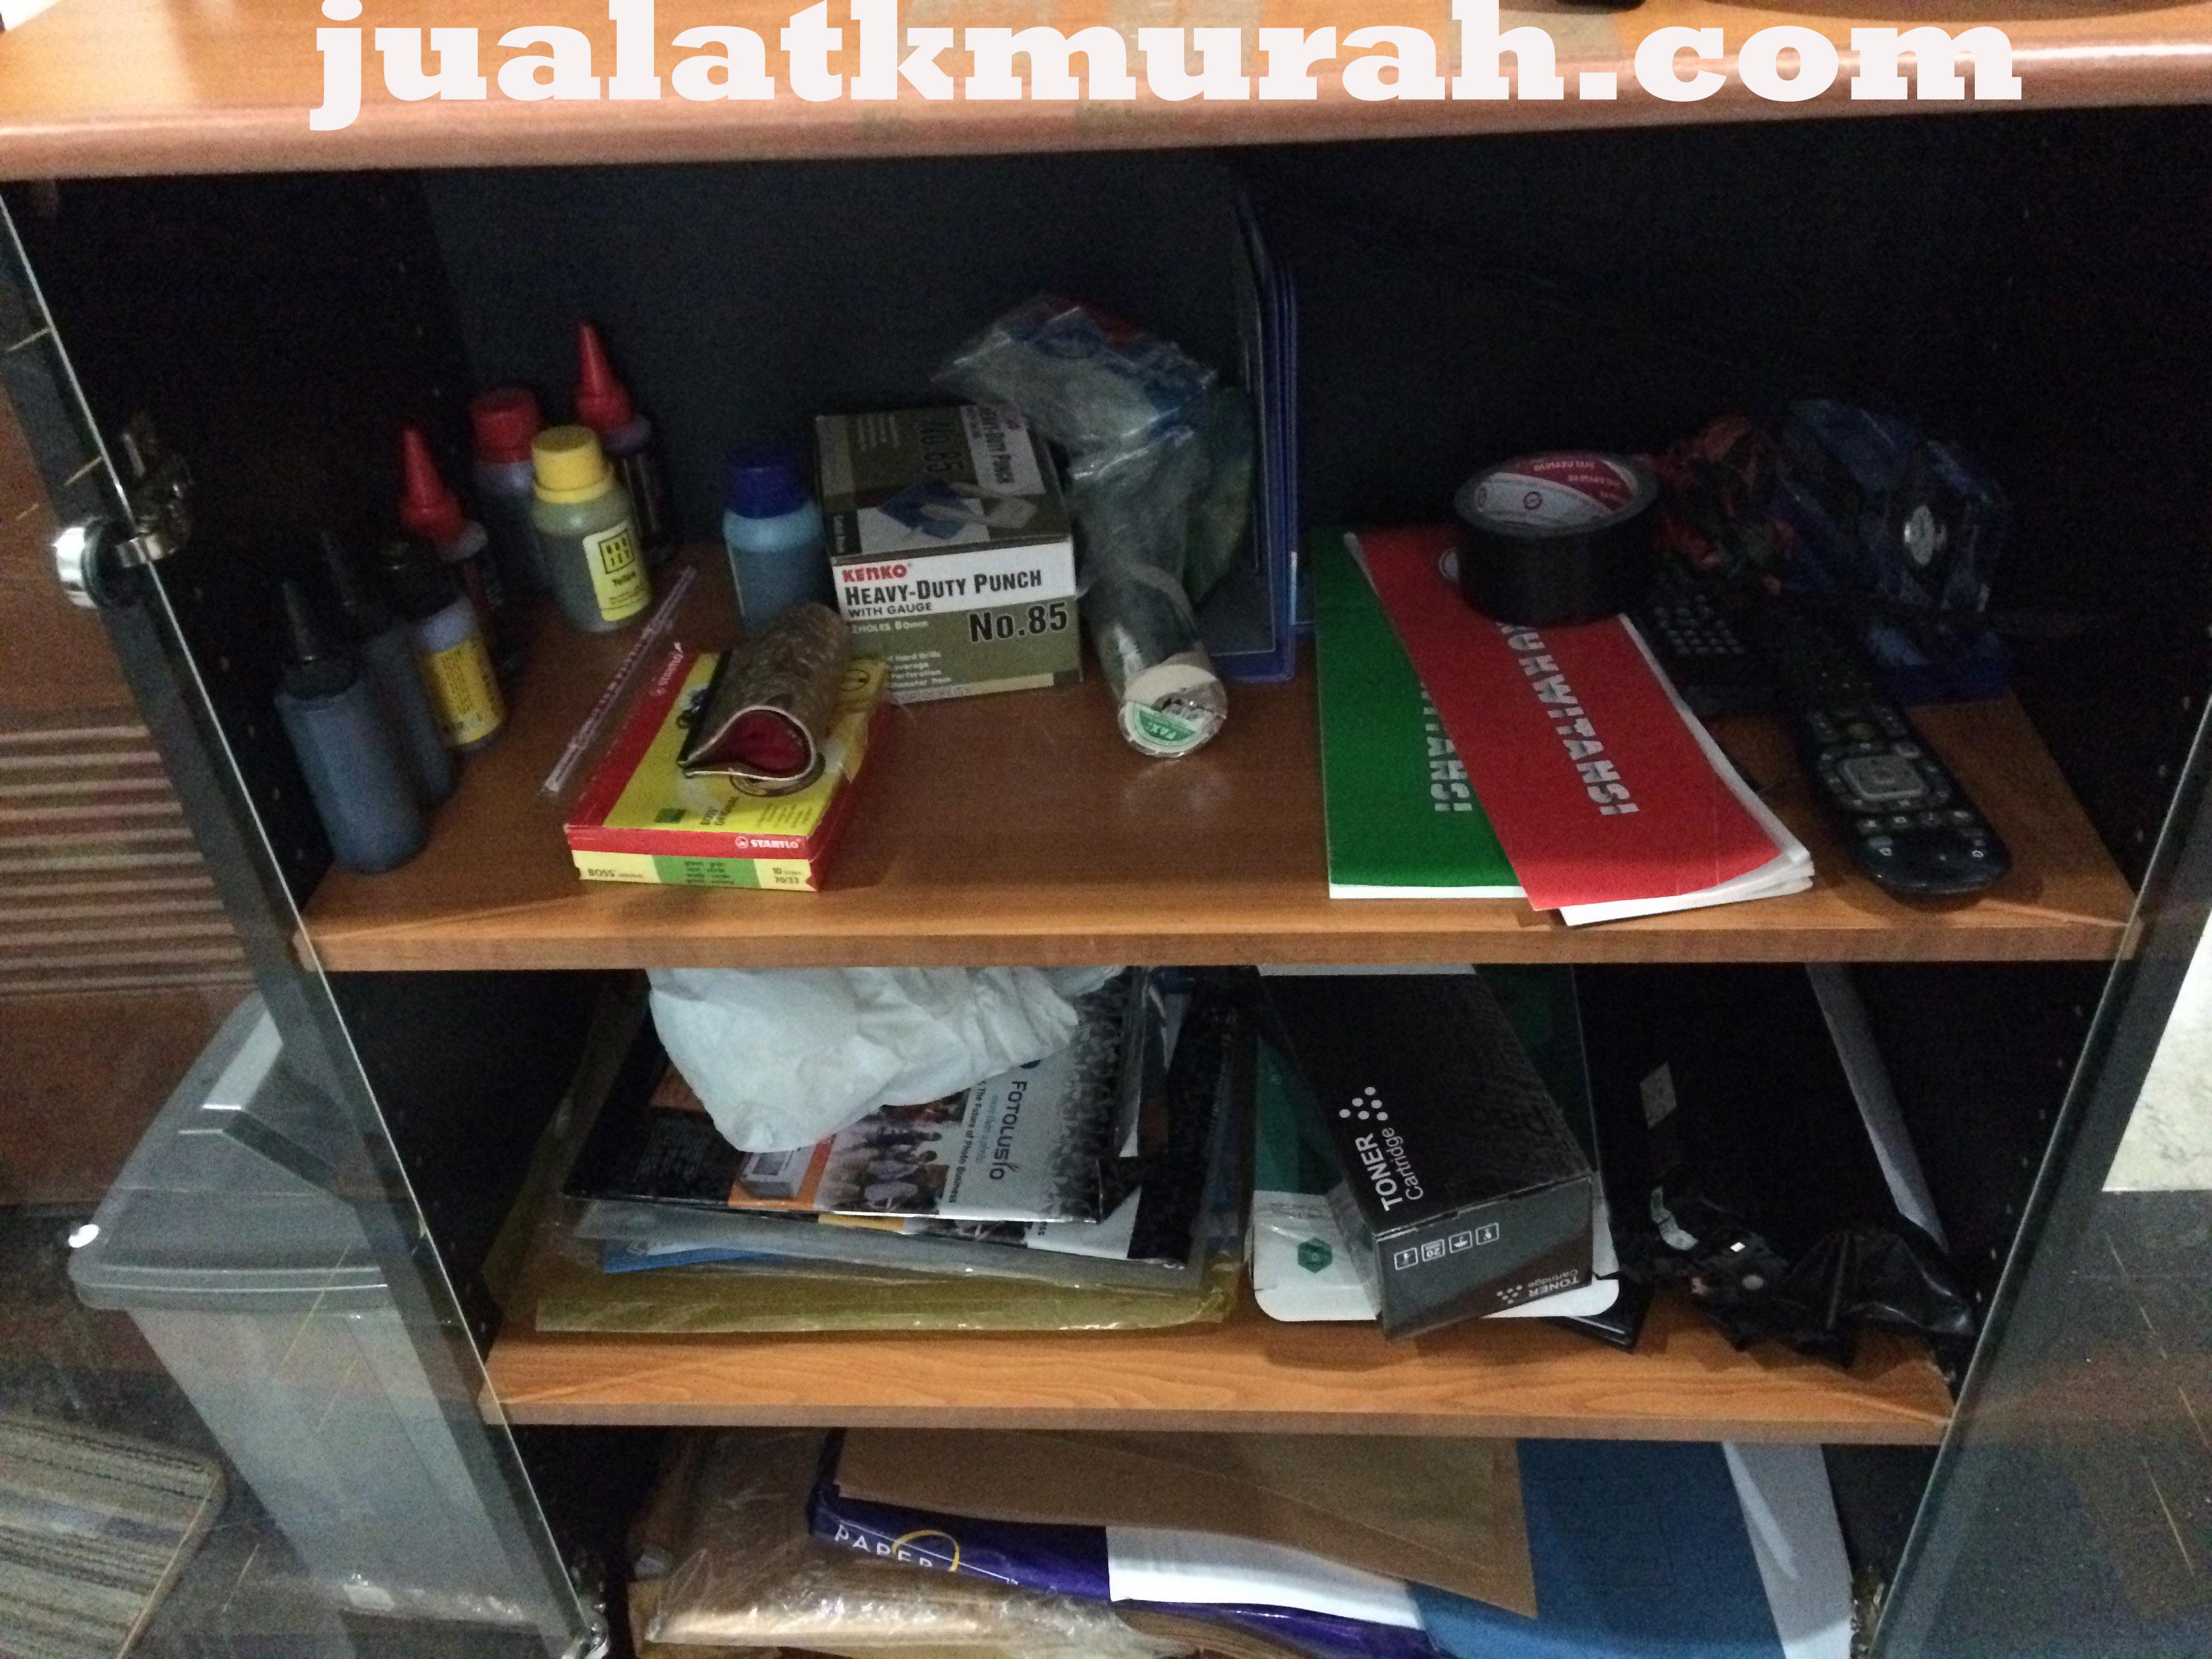 Jual ATK Murah Duren Tiga Jakarta Selatan